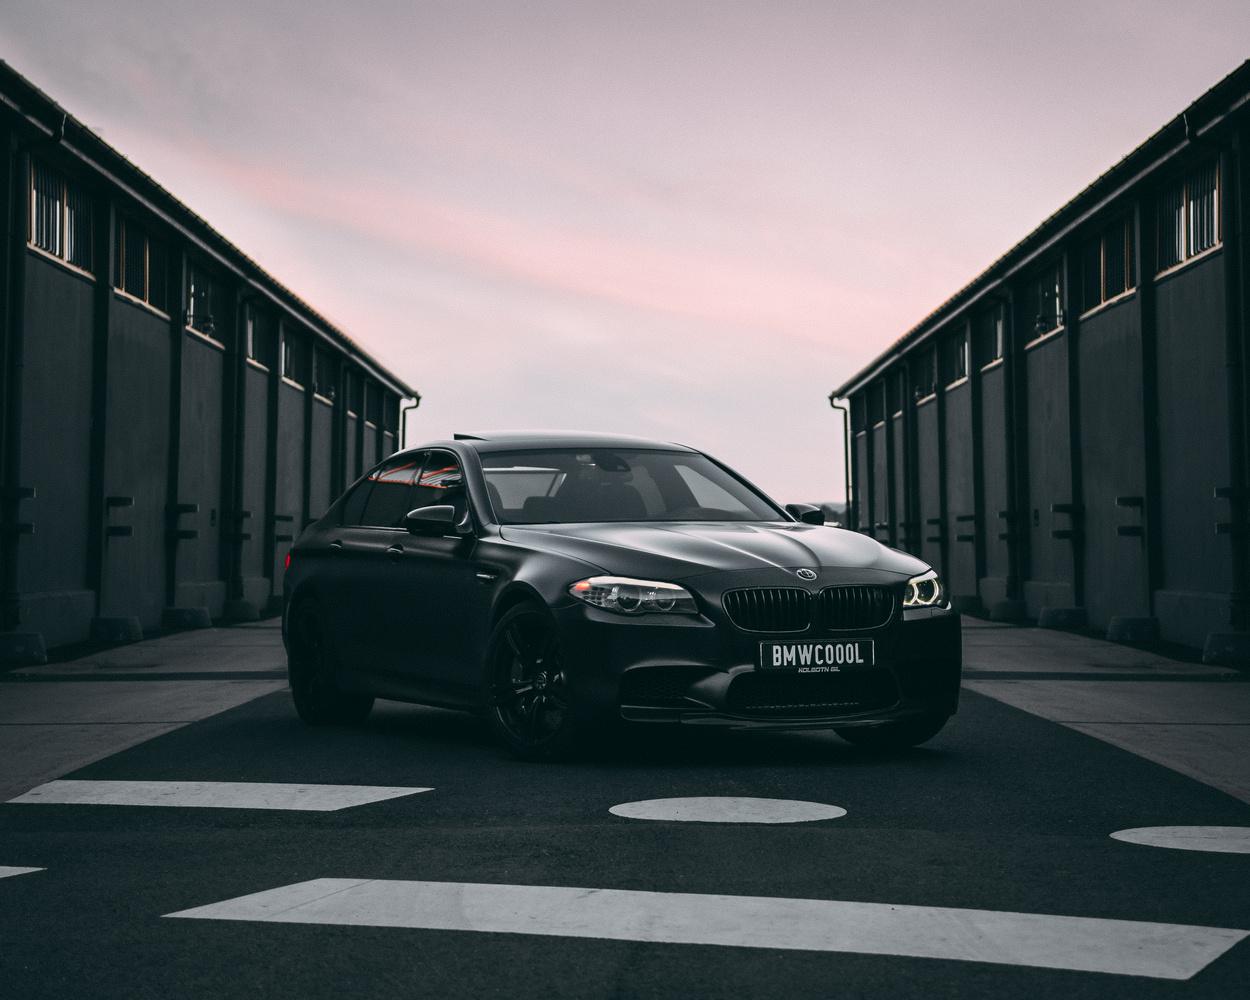 BMW M5 by Henrik Utne